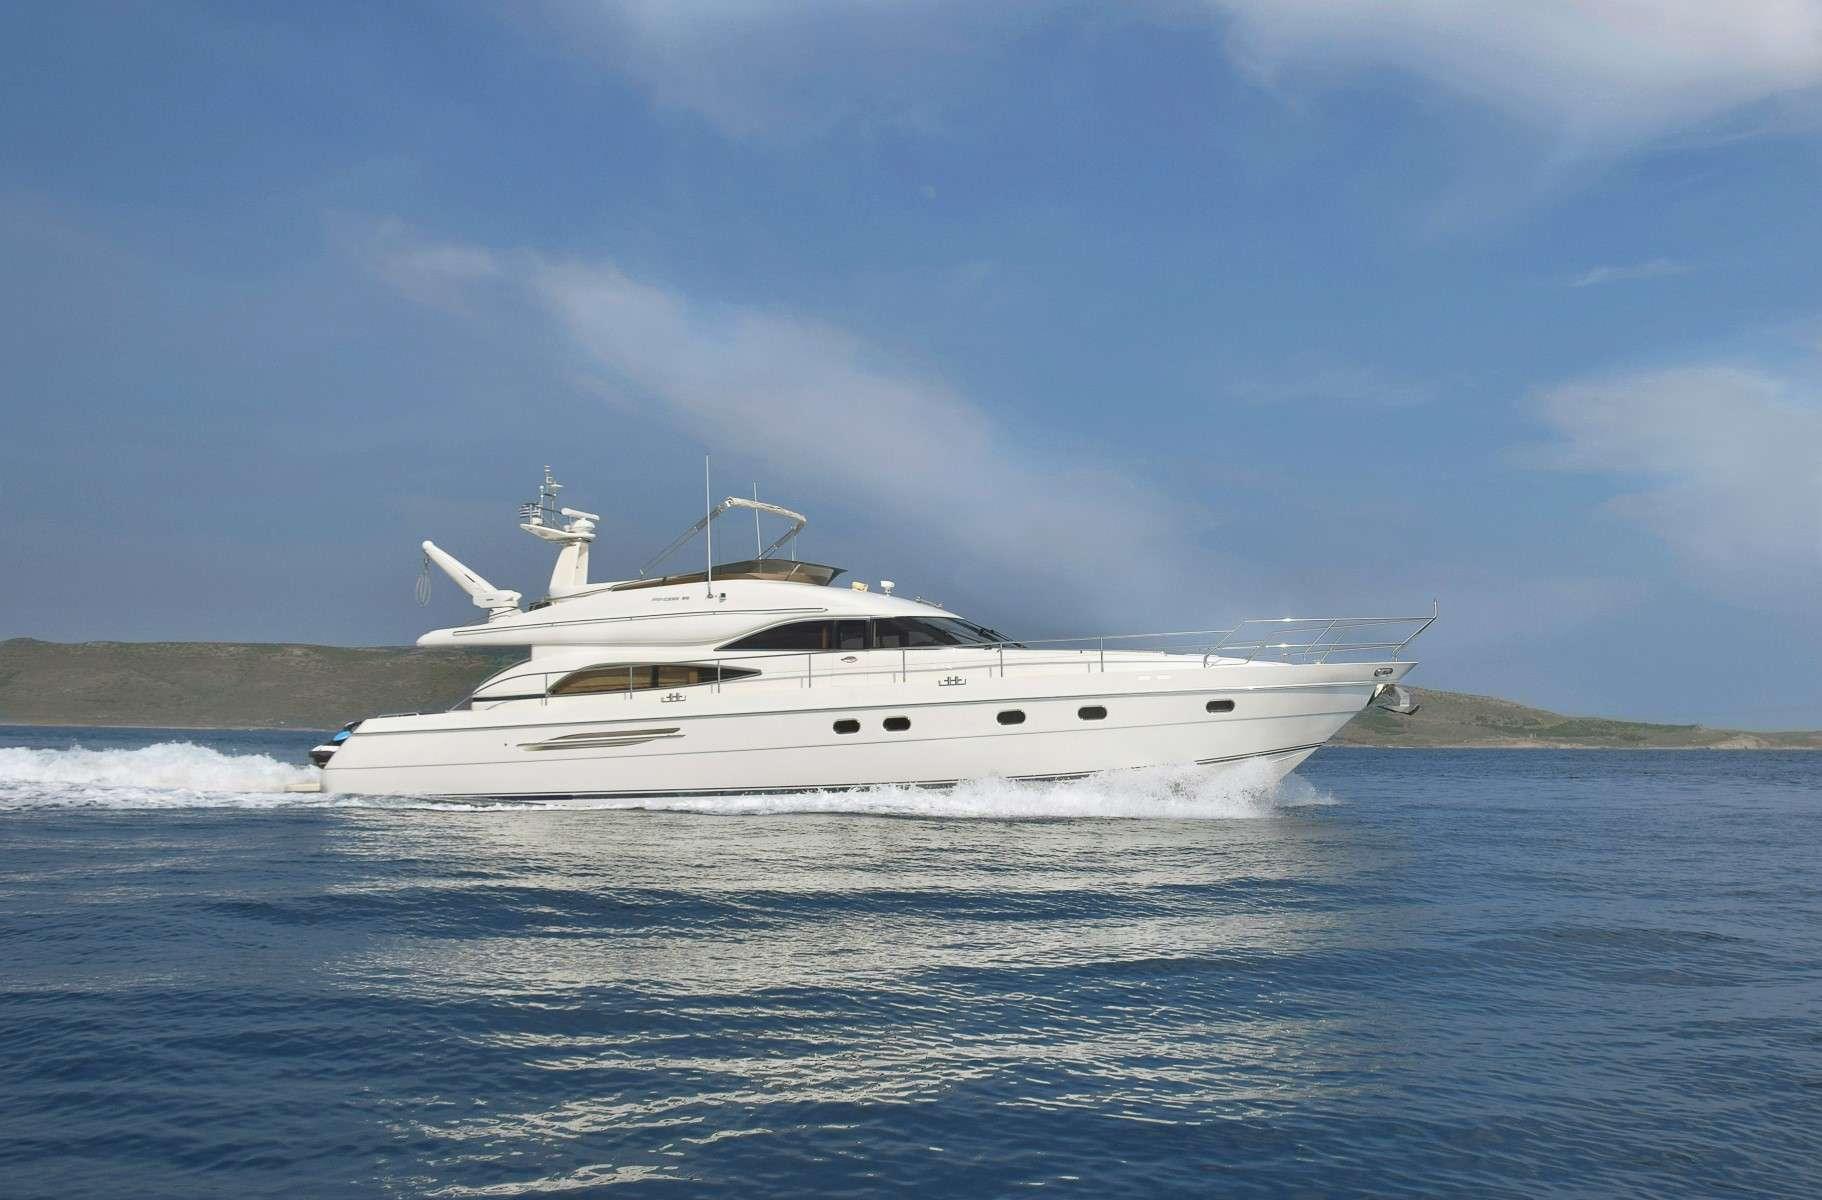 Main image of FAST BREAK yacht